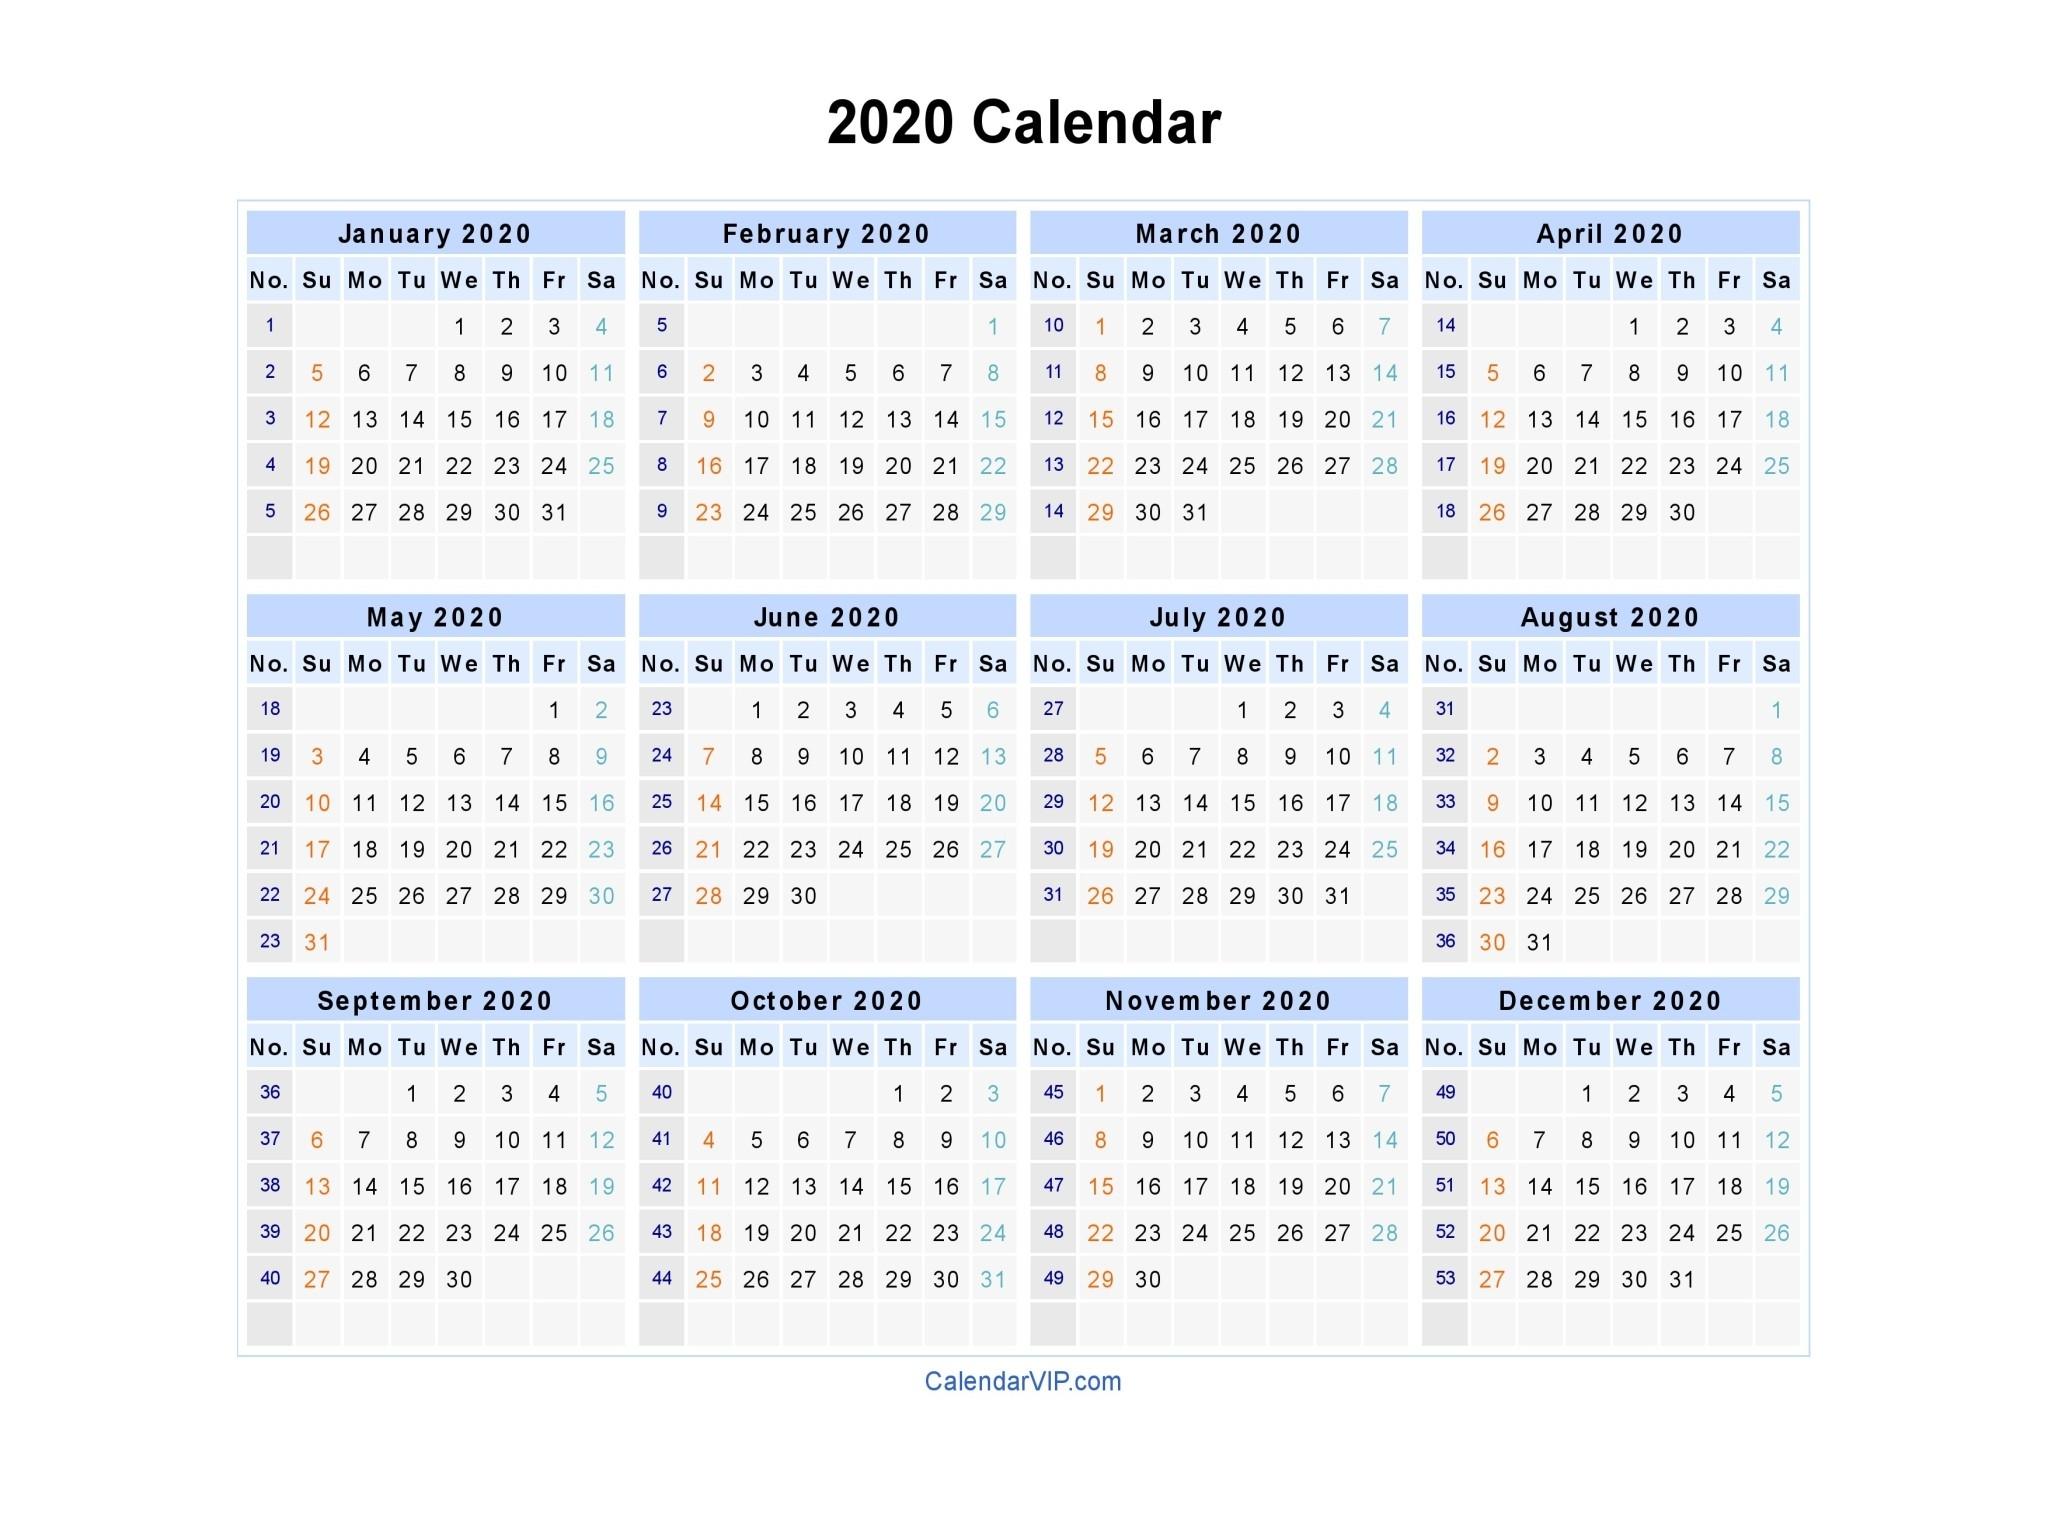 2020 Calendar - Blank Printable Calendar Template In Pdf-Microsoft Word 2020 Calendar Template